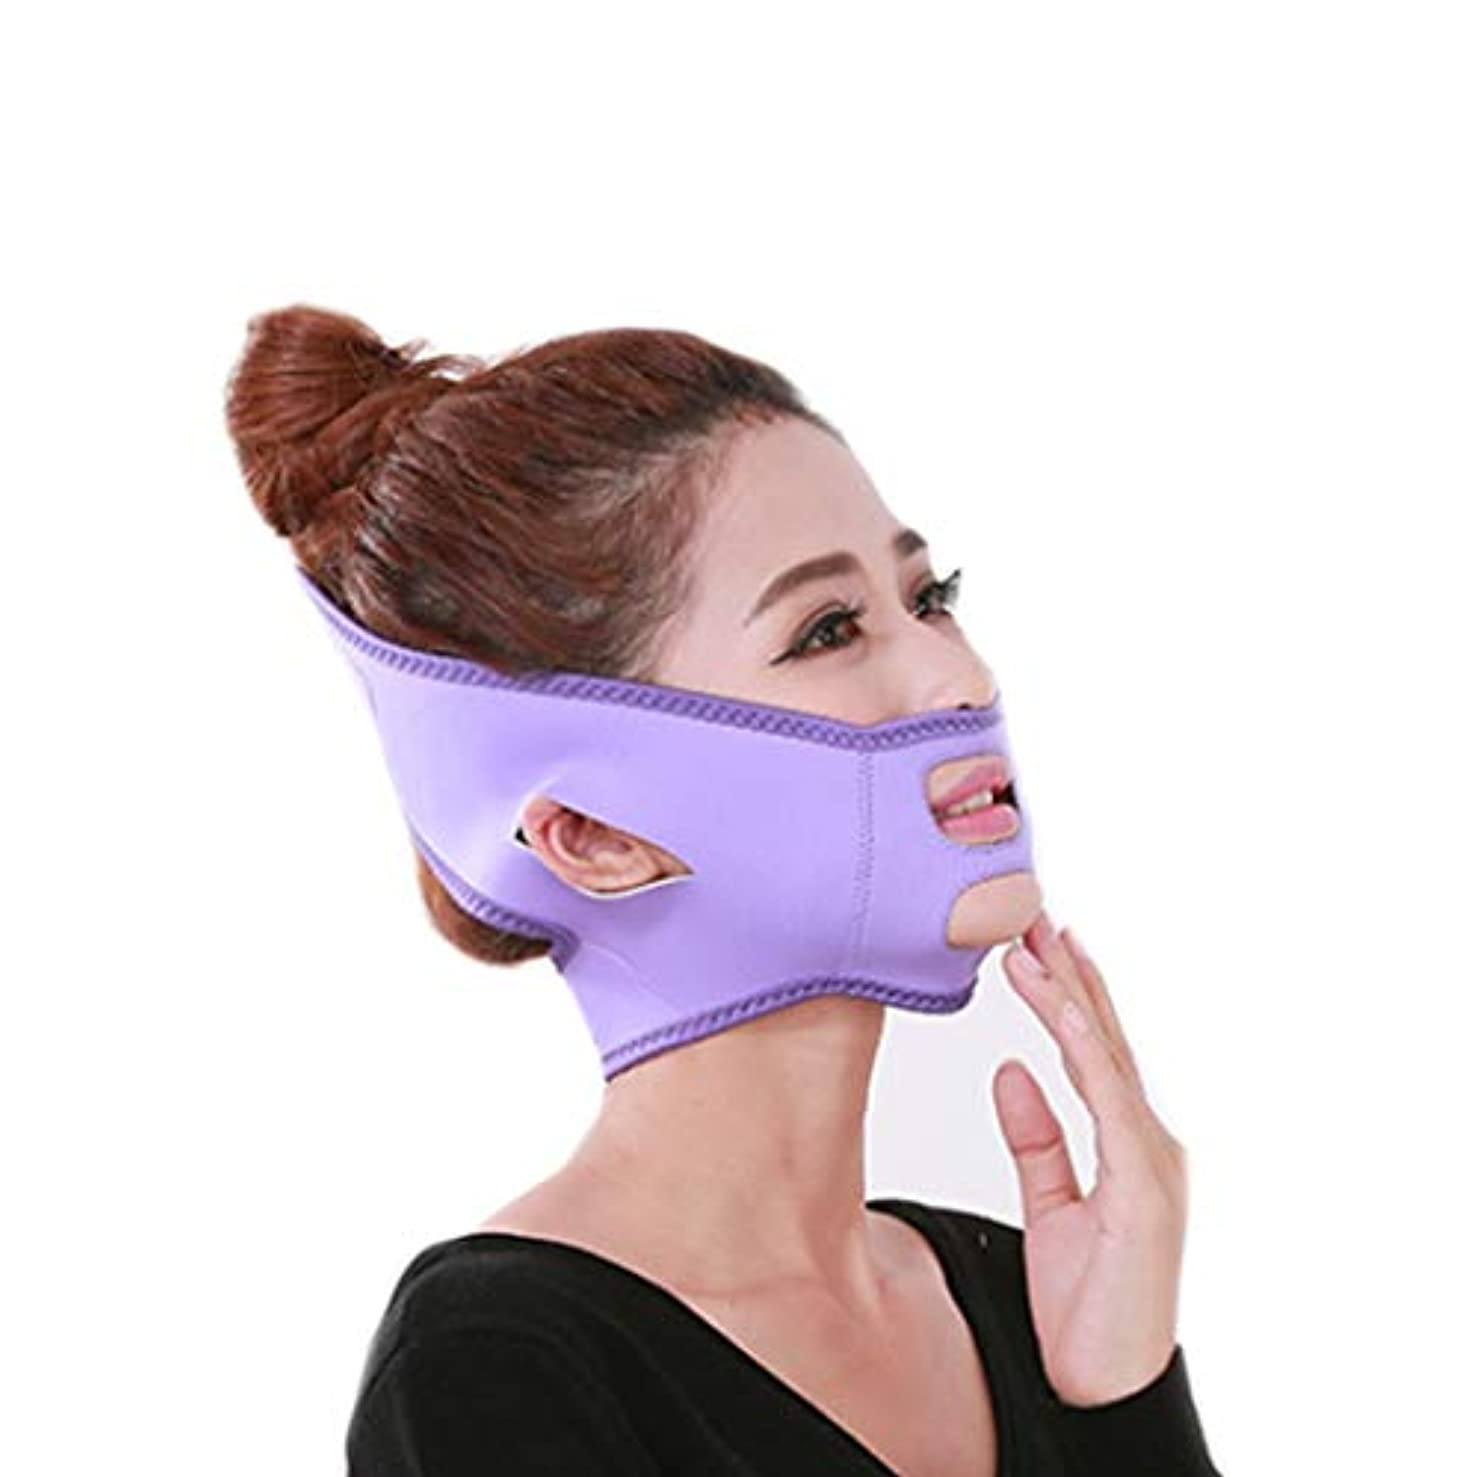 XHLMRMJ フェイスリフトテープ&バンド、フェイススリミングマスク、ダブルチン、ダブルチンリデューサー、シワ防止マスク、リフティングシェイプ(フリーサイズ) (Color : Purple)